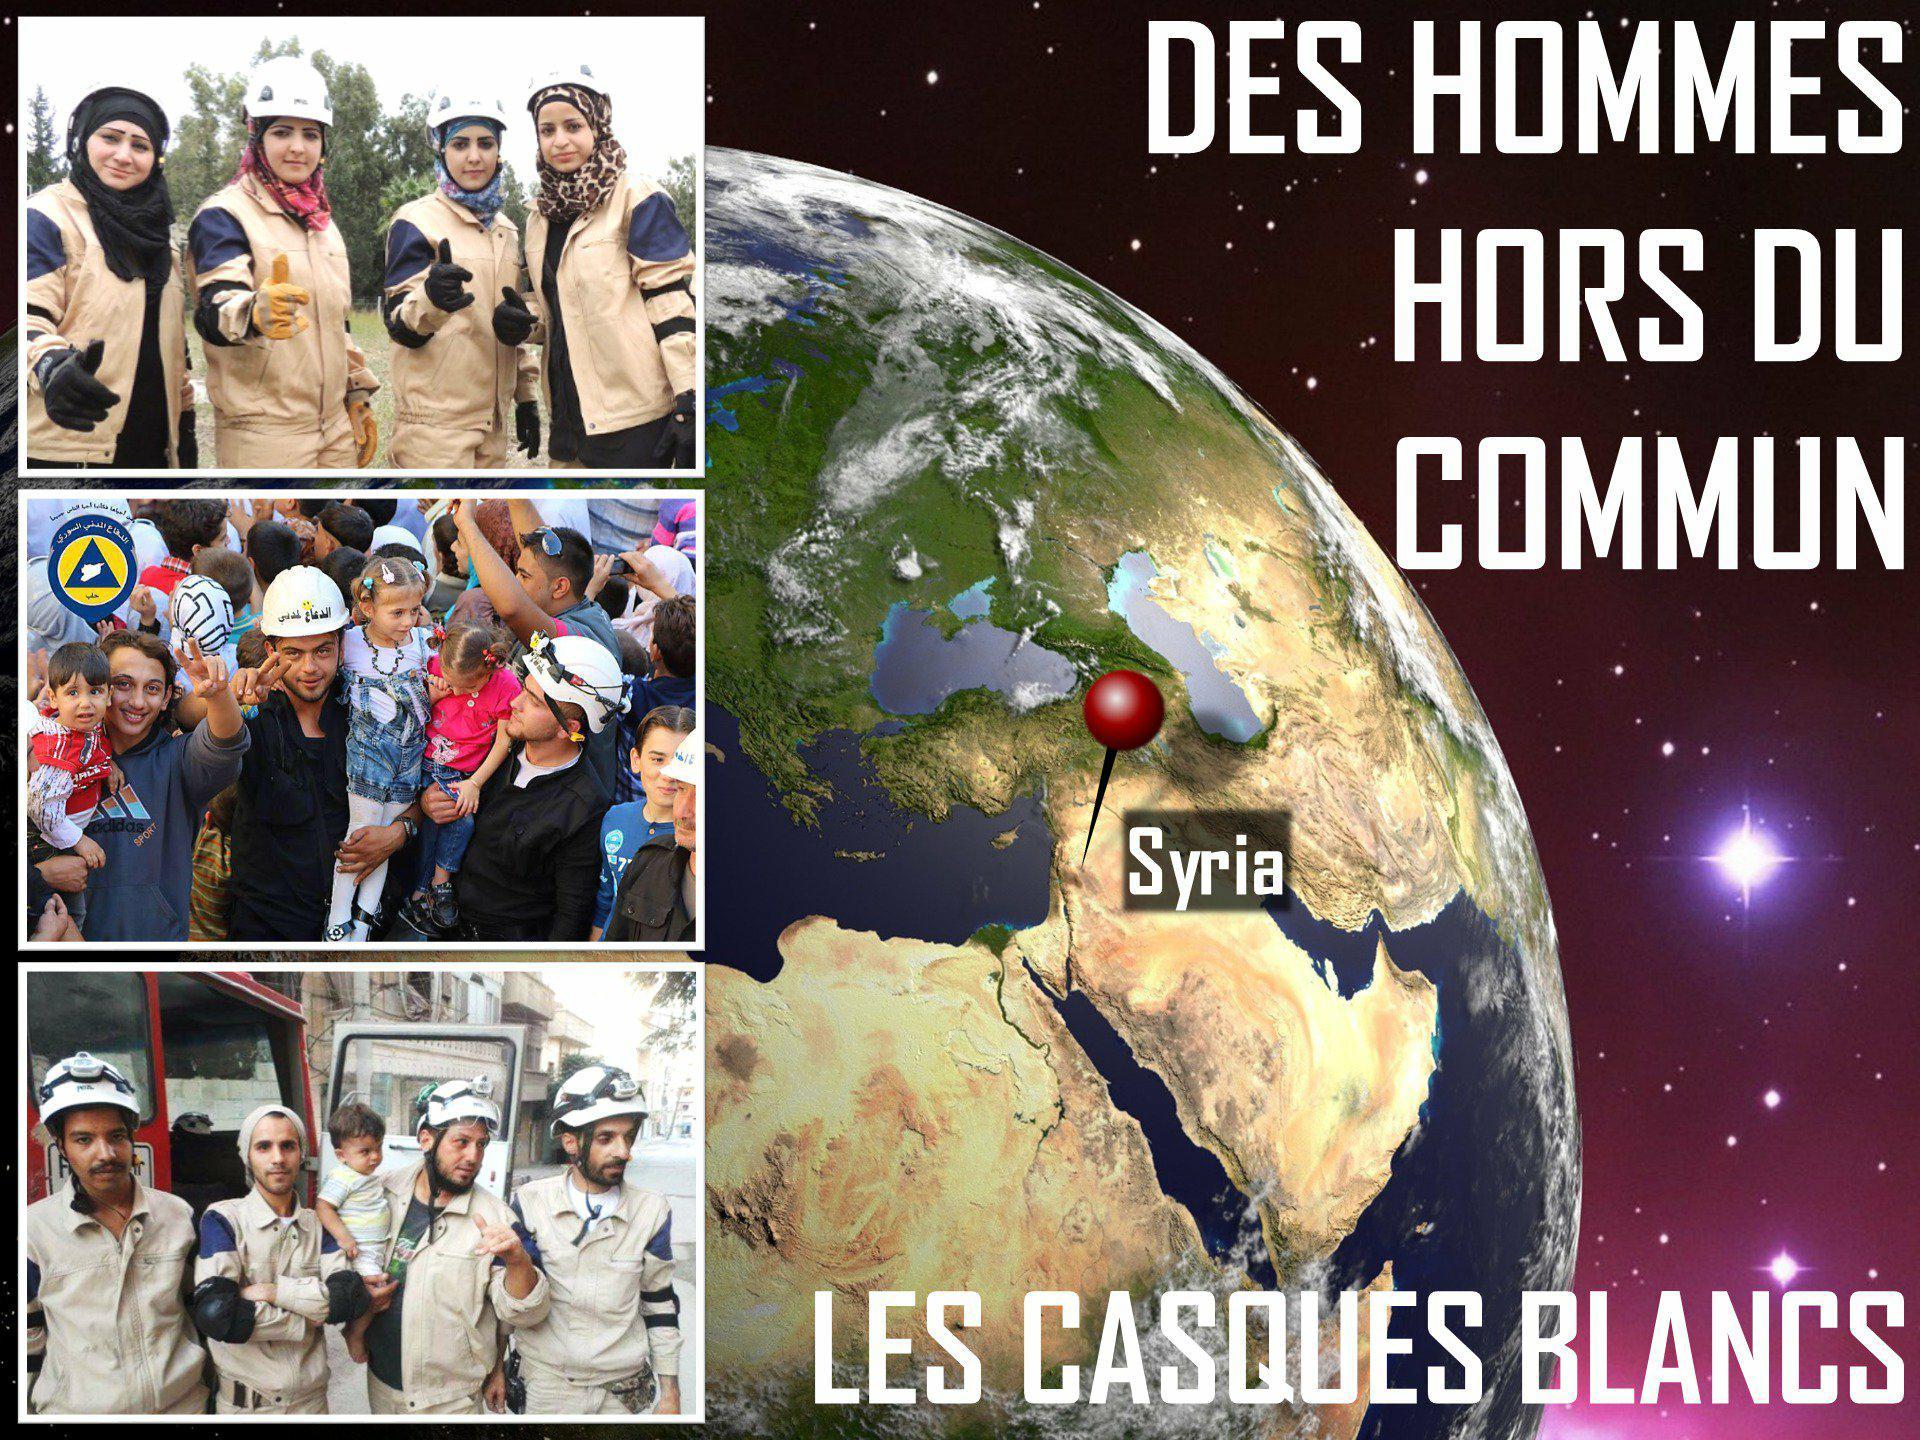 Tweetstorm en solidarité avec les casques blancs en Syrie